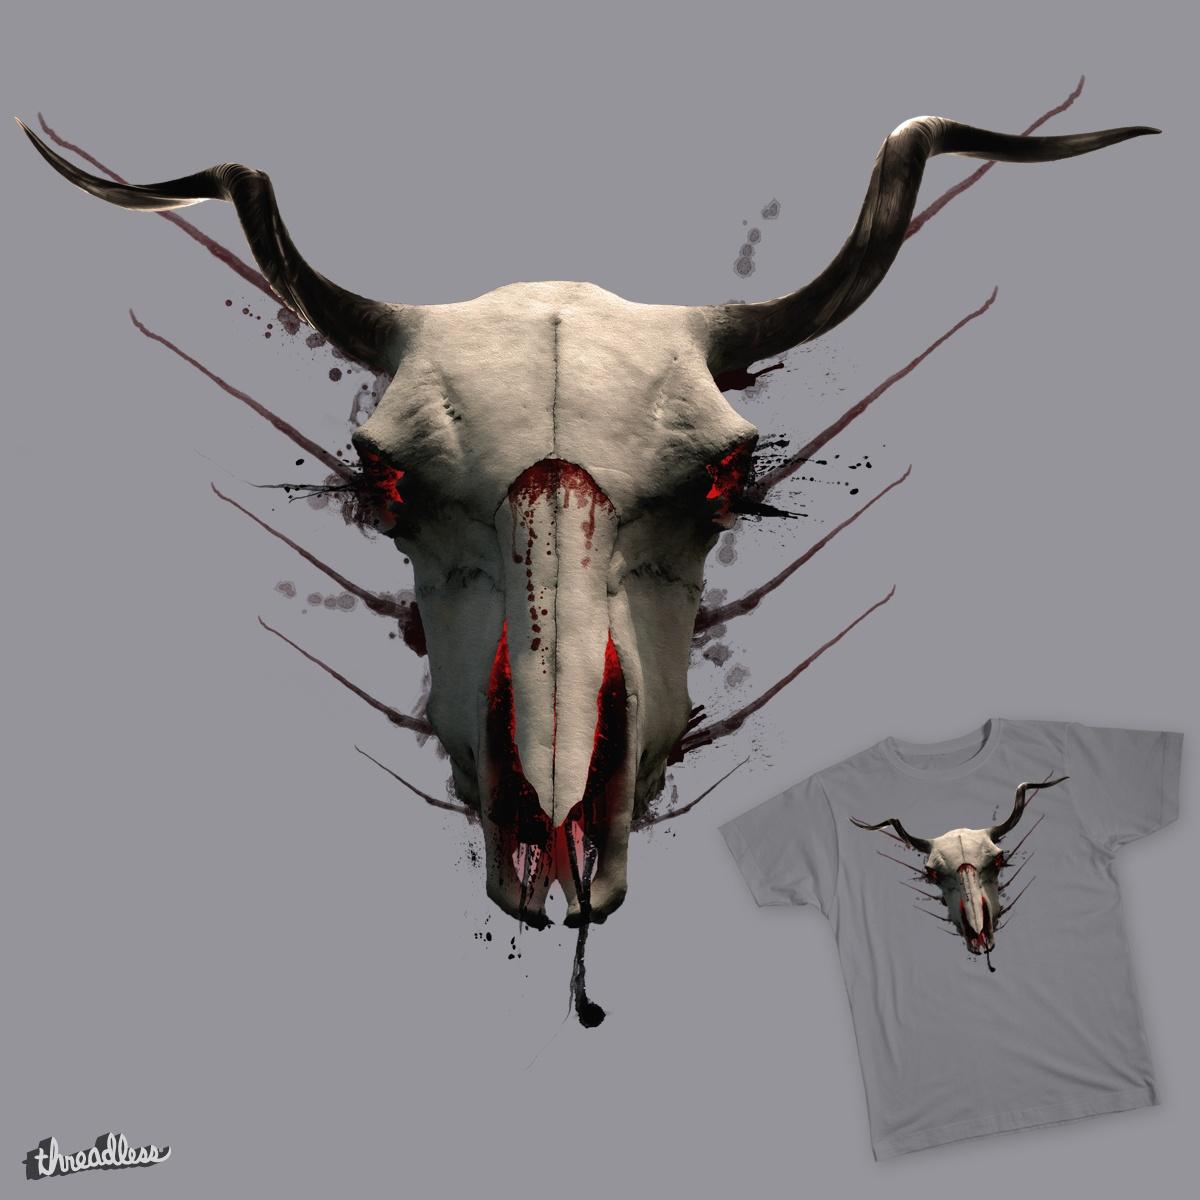 Netherworld Beast by raz-draz on Threadless